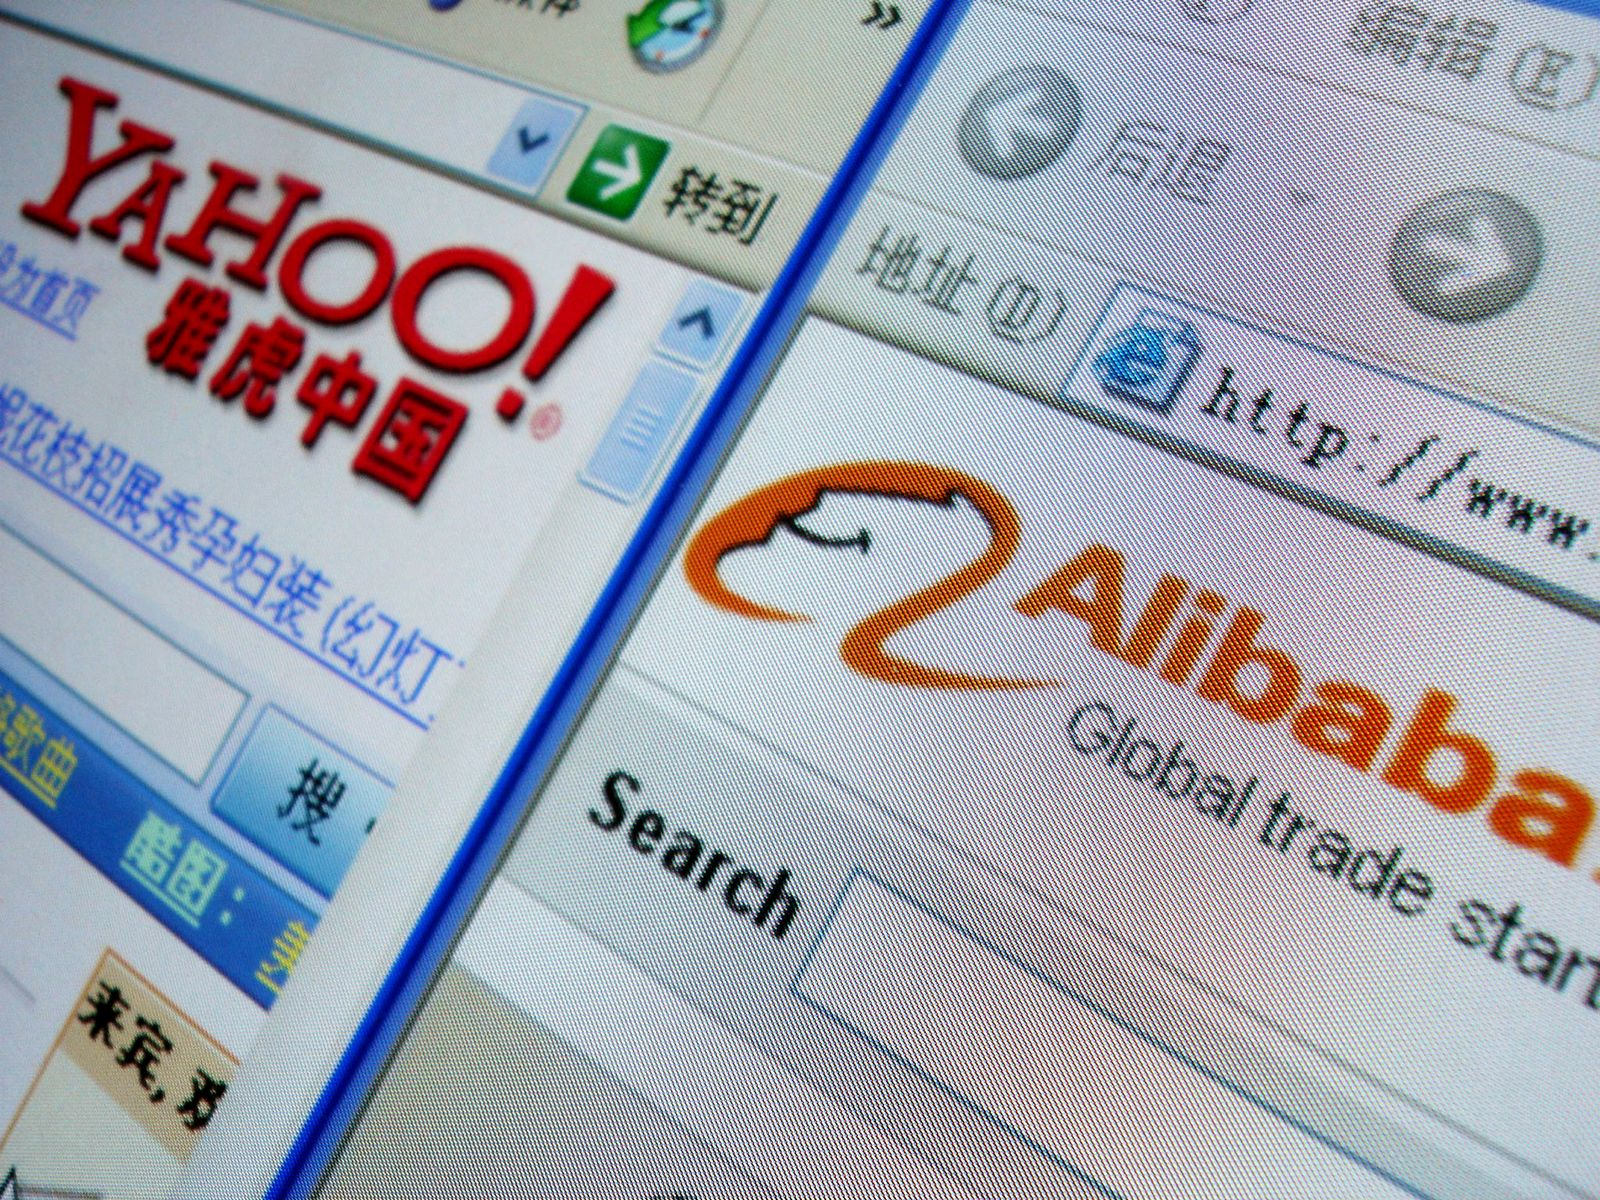 Yahoo/ Alibaba/ China